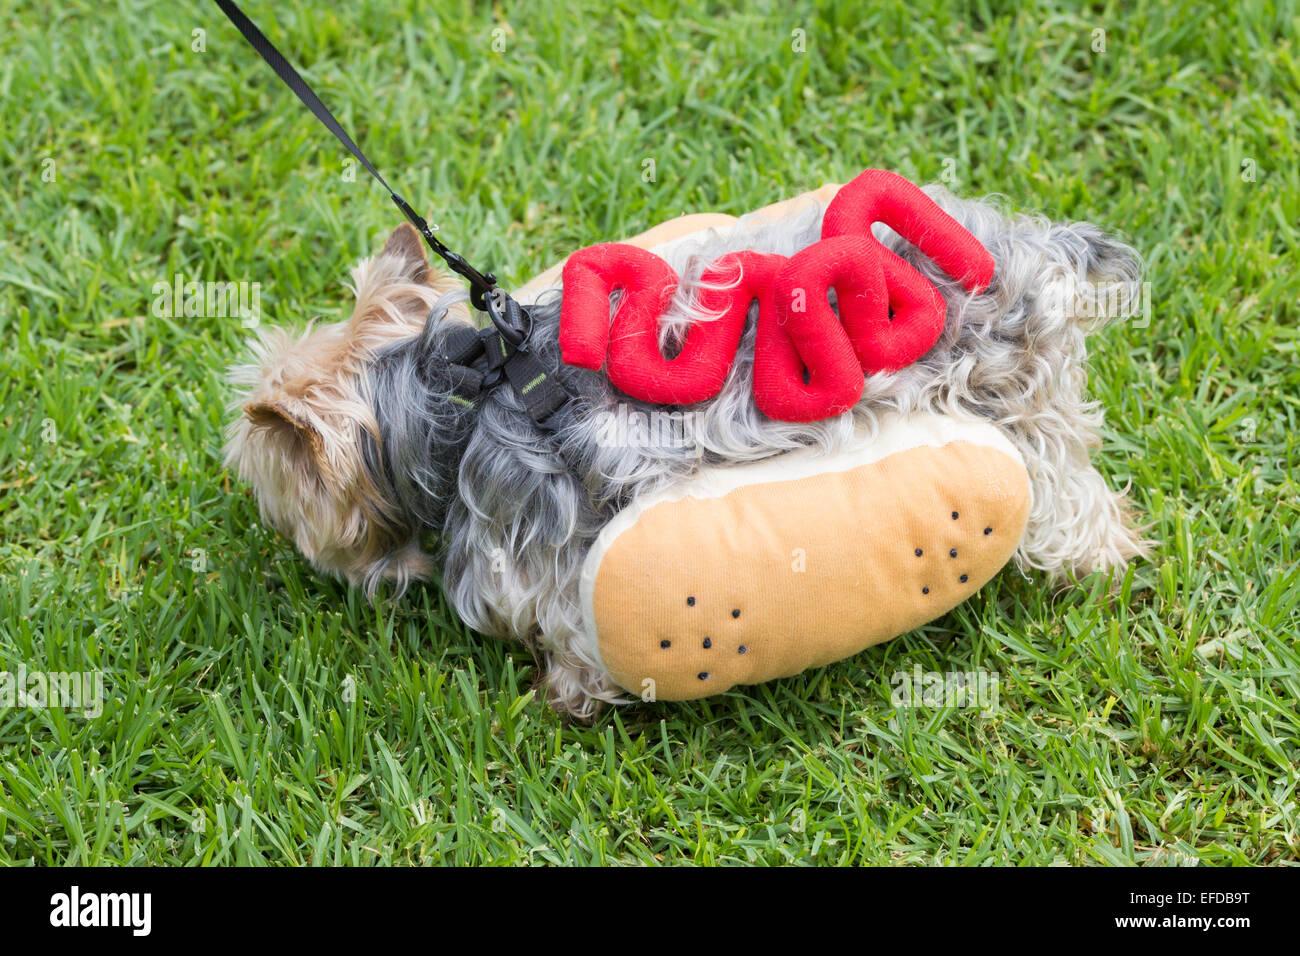 Yorkshire Terrier Vestito Come Hot Dog A Dog Fancy Dress Giorno A